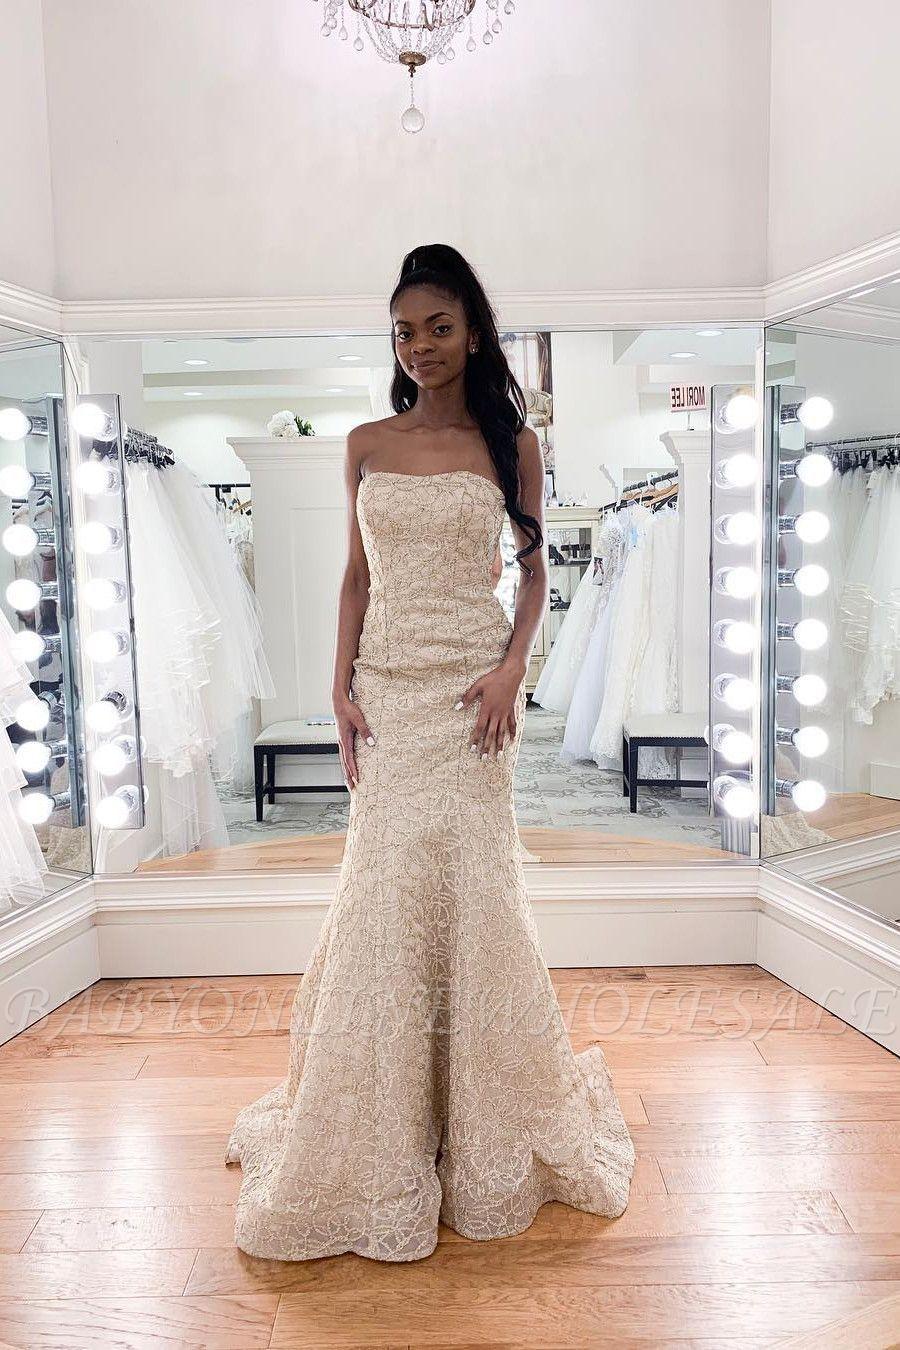 Luxury Strapless Beadings Mermaid Wedding Dress Affordable Sleeveless Long Bridal Gown Long Bridal Gown Affordable Wedding Dresses Affordable Dresses [ 1350 x 900 Pixel ]